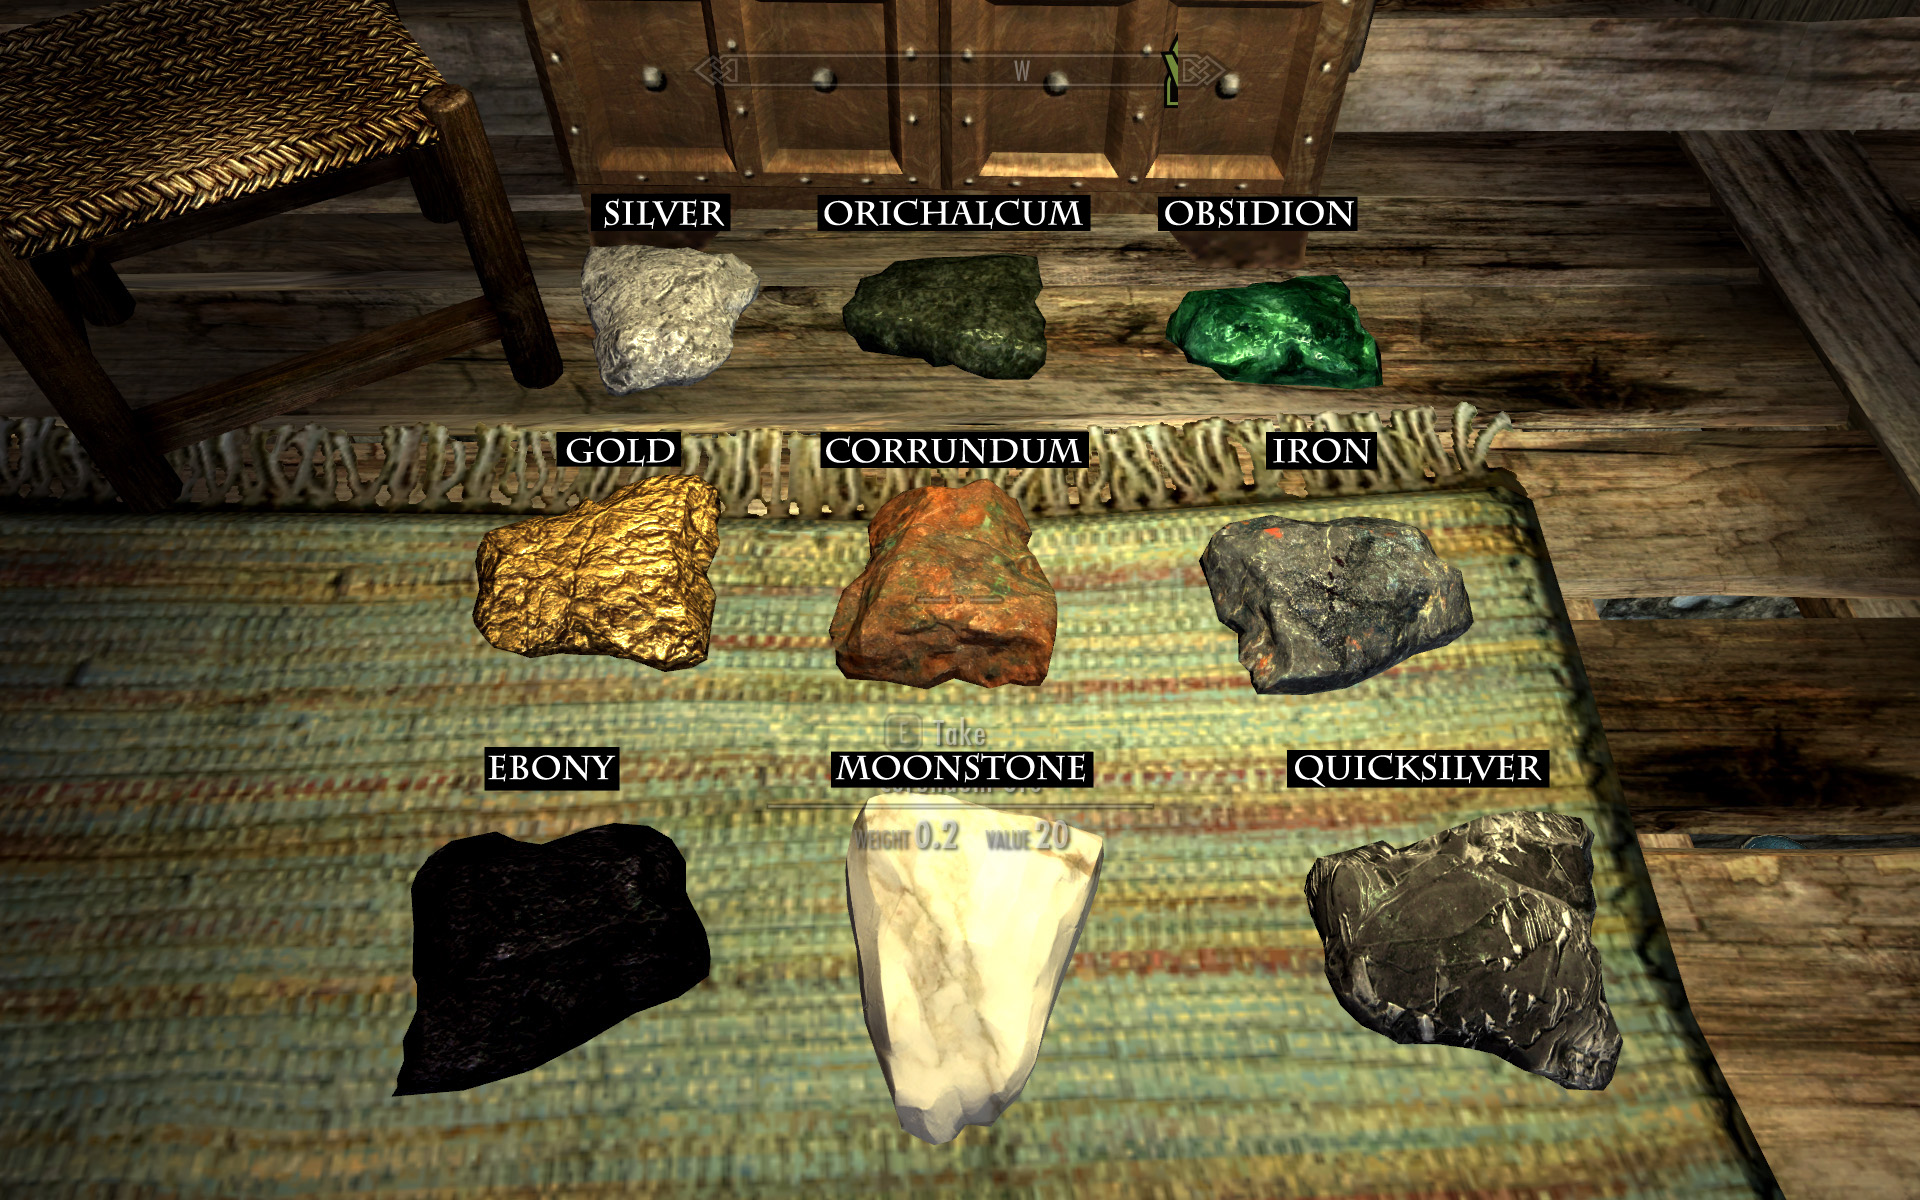 Скачать новые текстуры для minecraft ...: pictures11.ru/skachat-novye-tekstury-dlya-minecraft.html